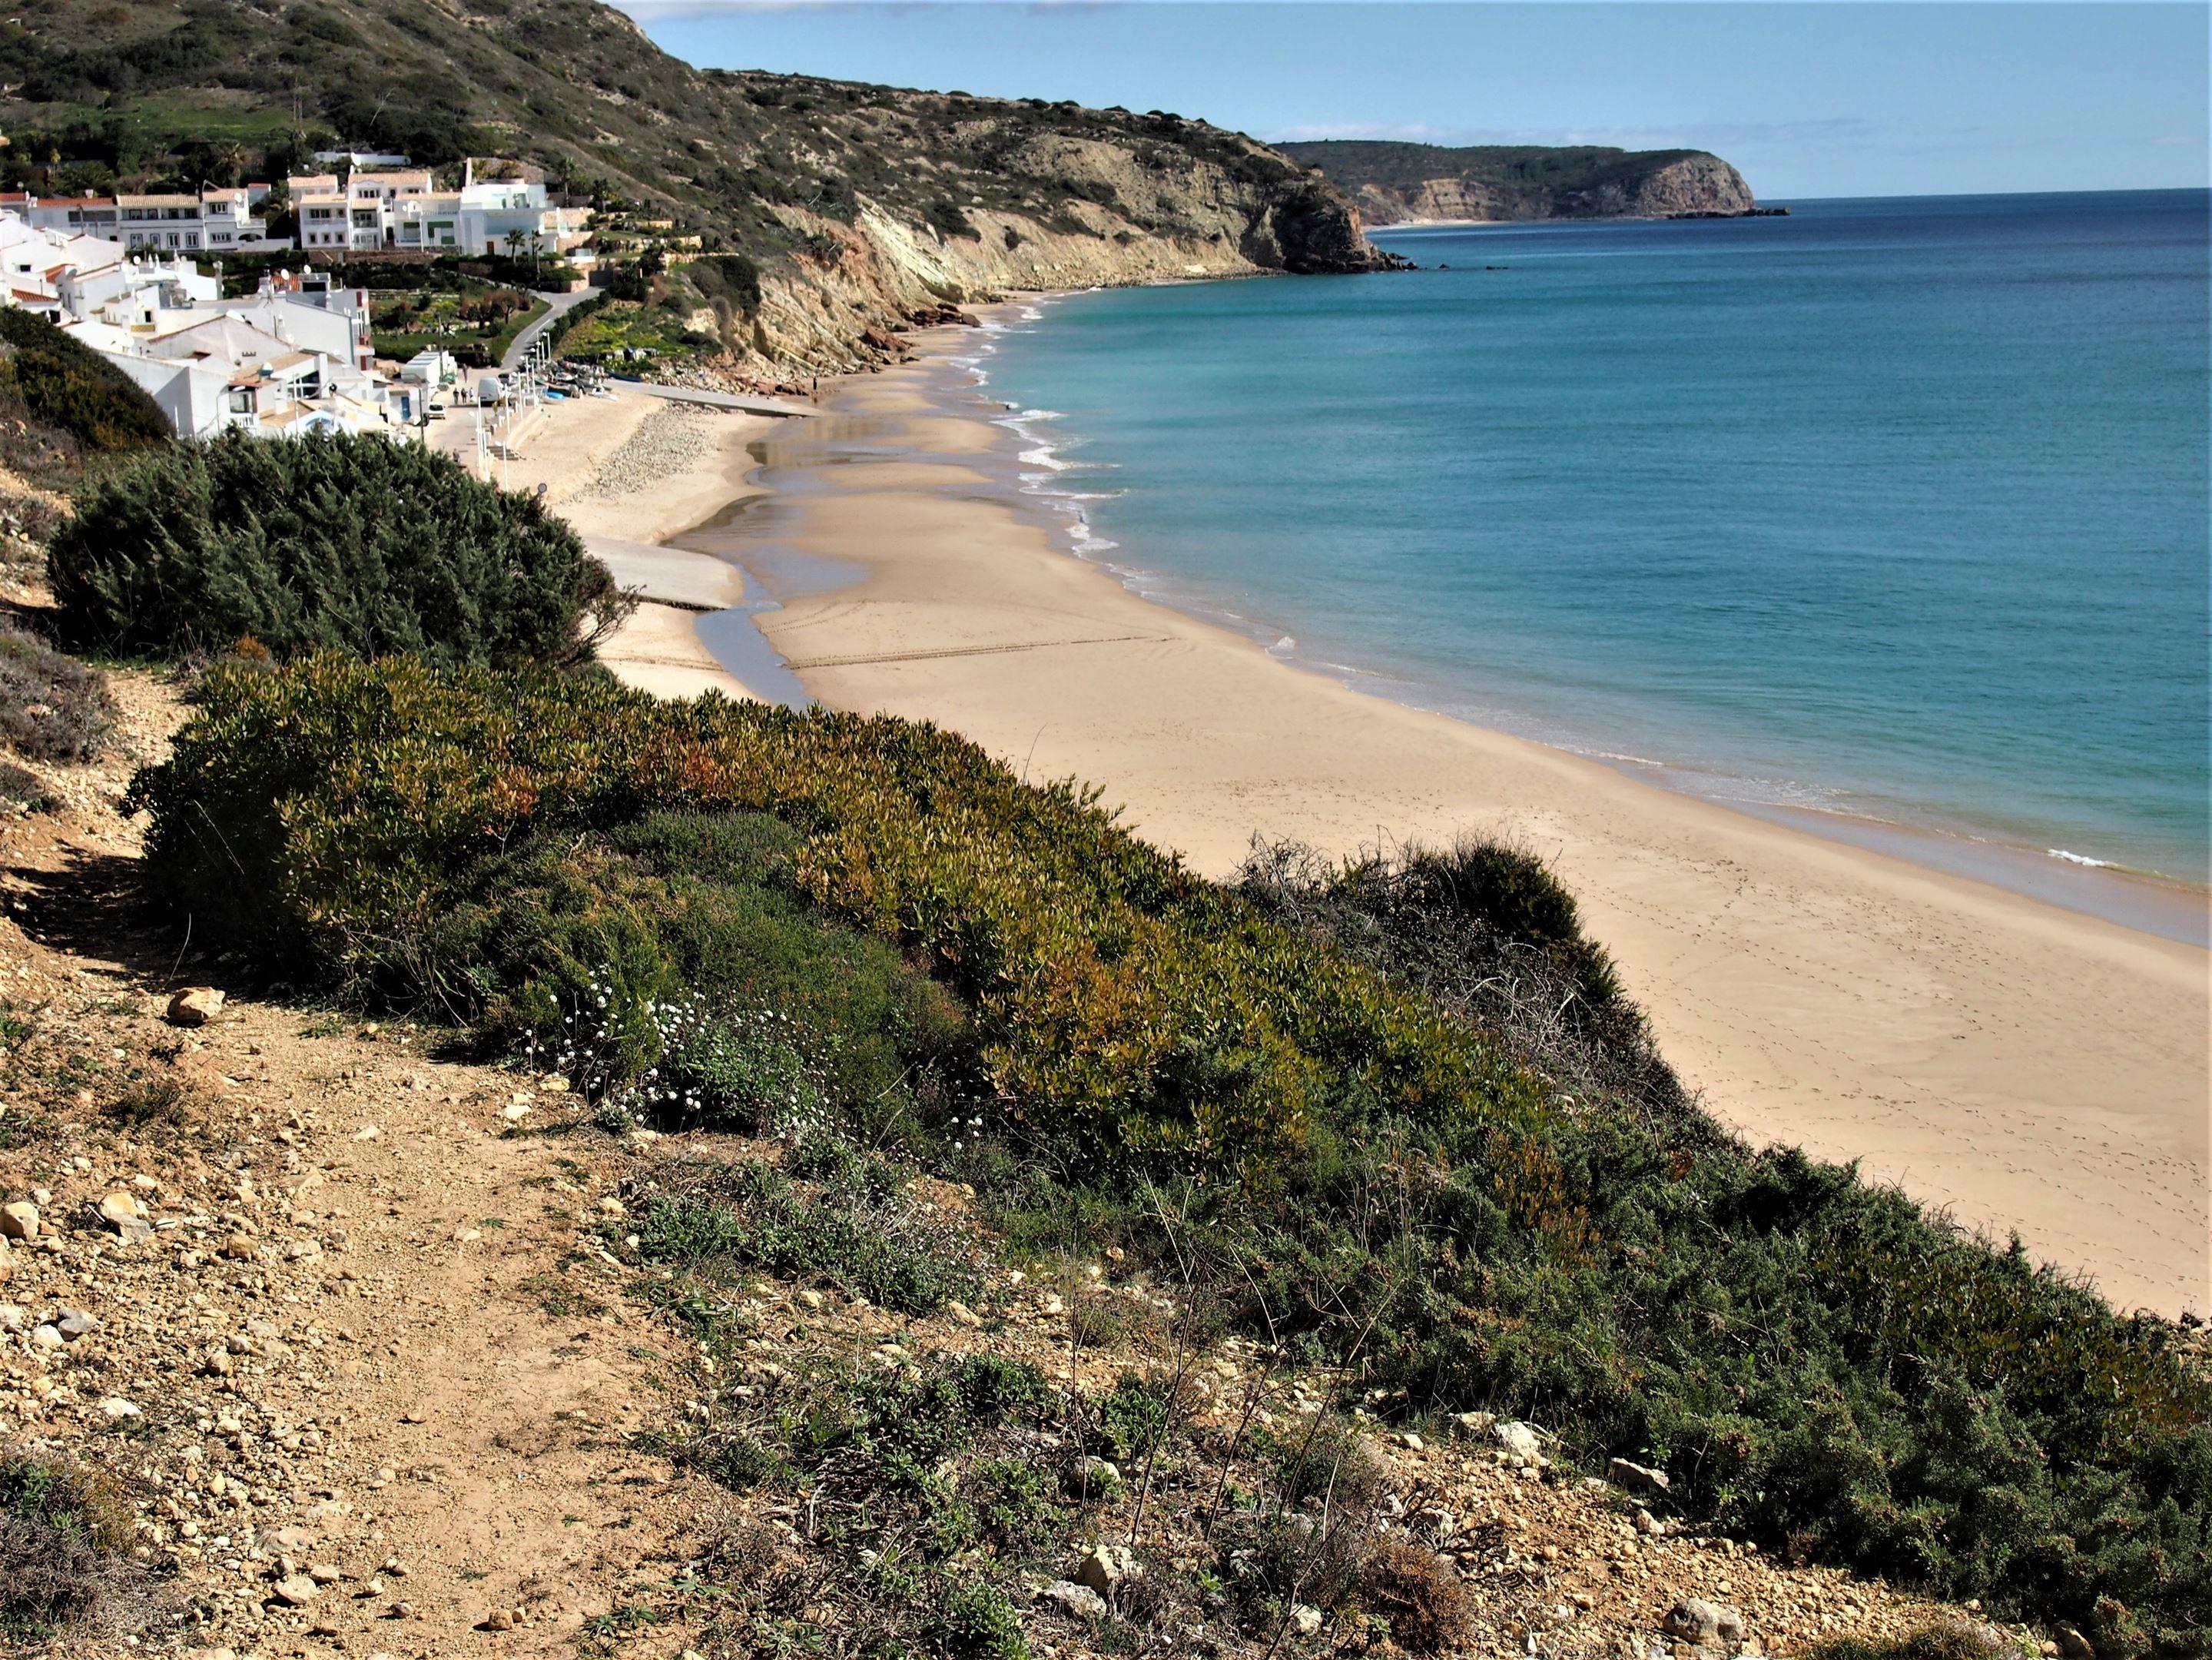 Praia da Salema, Algarve